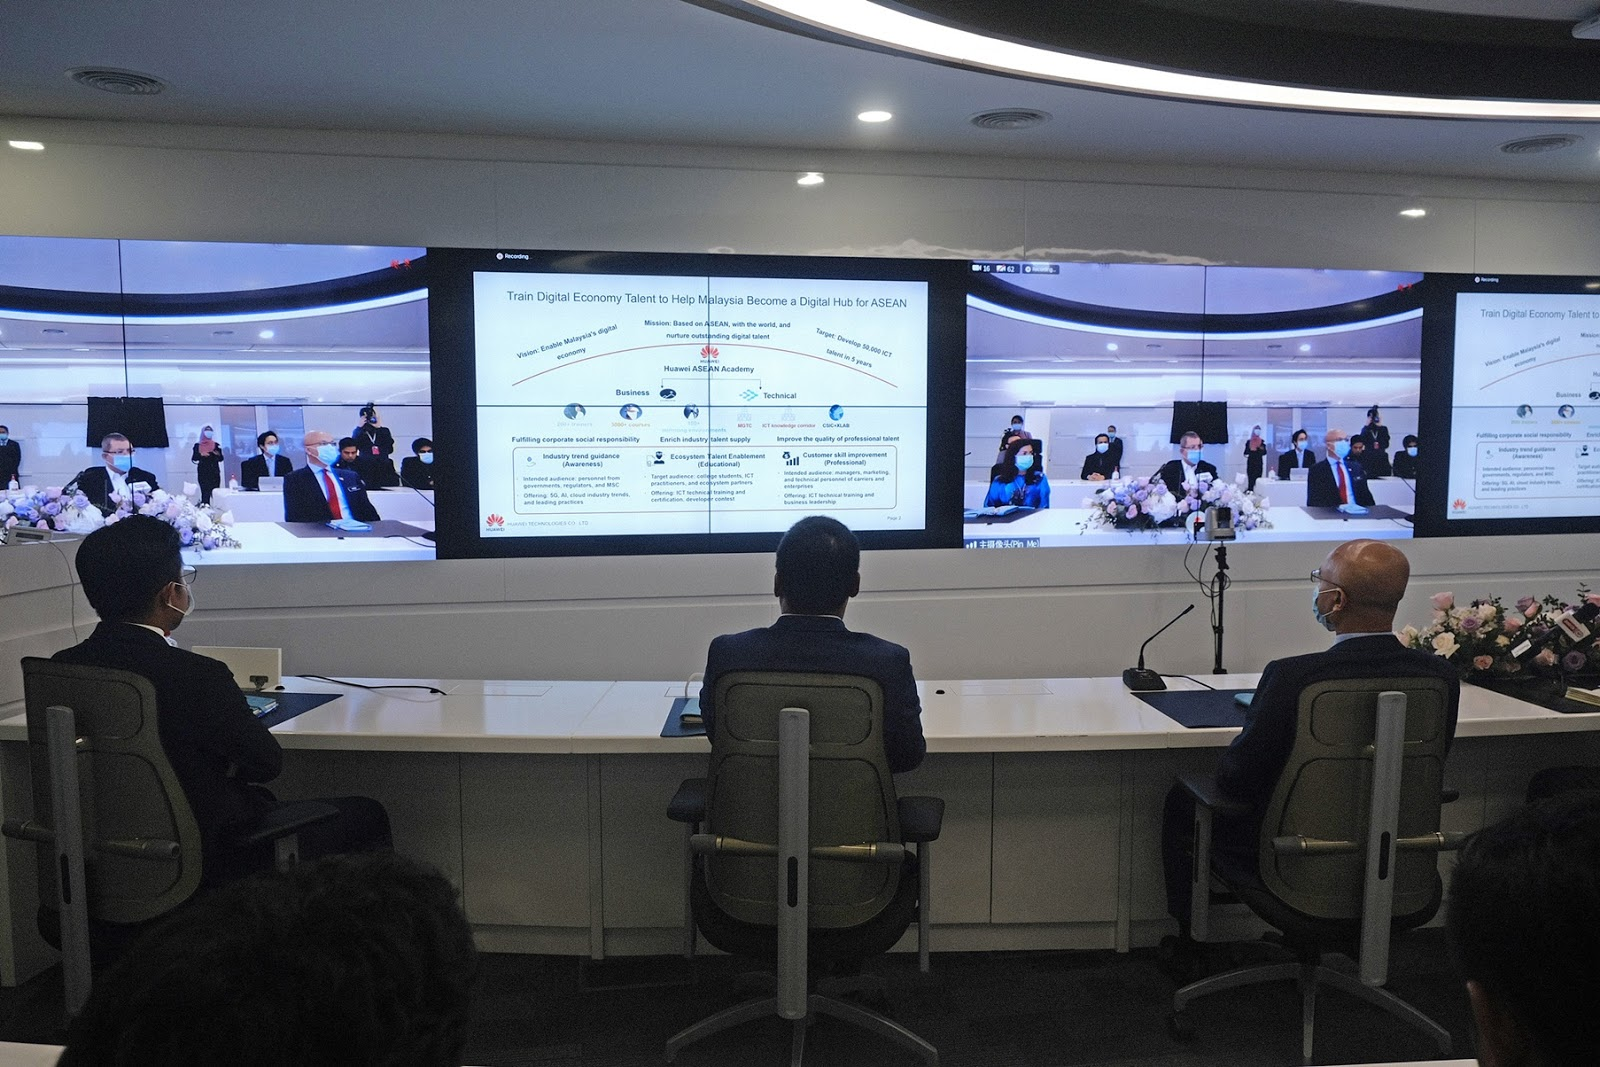 HUAWEI เปิดตัว ASEAN Academy เสริมศักยภาพบุคลากรด้านดิจิทัล เร่งพัฒนา Digital Ecosystem